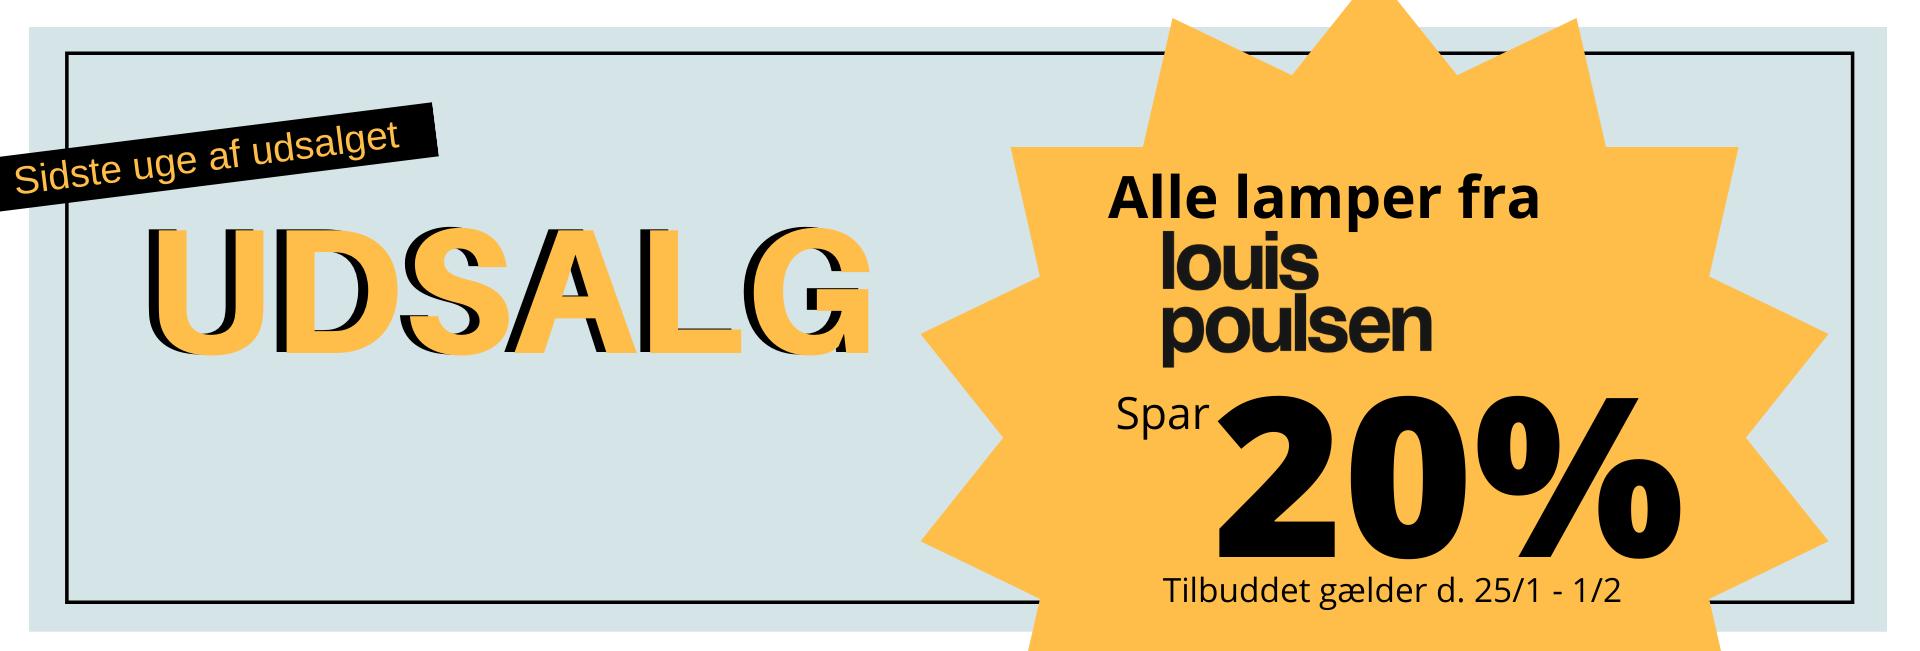 Januarudsalg - Louis Poulsen